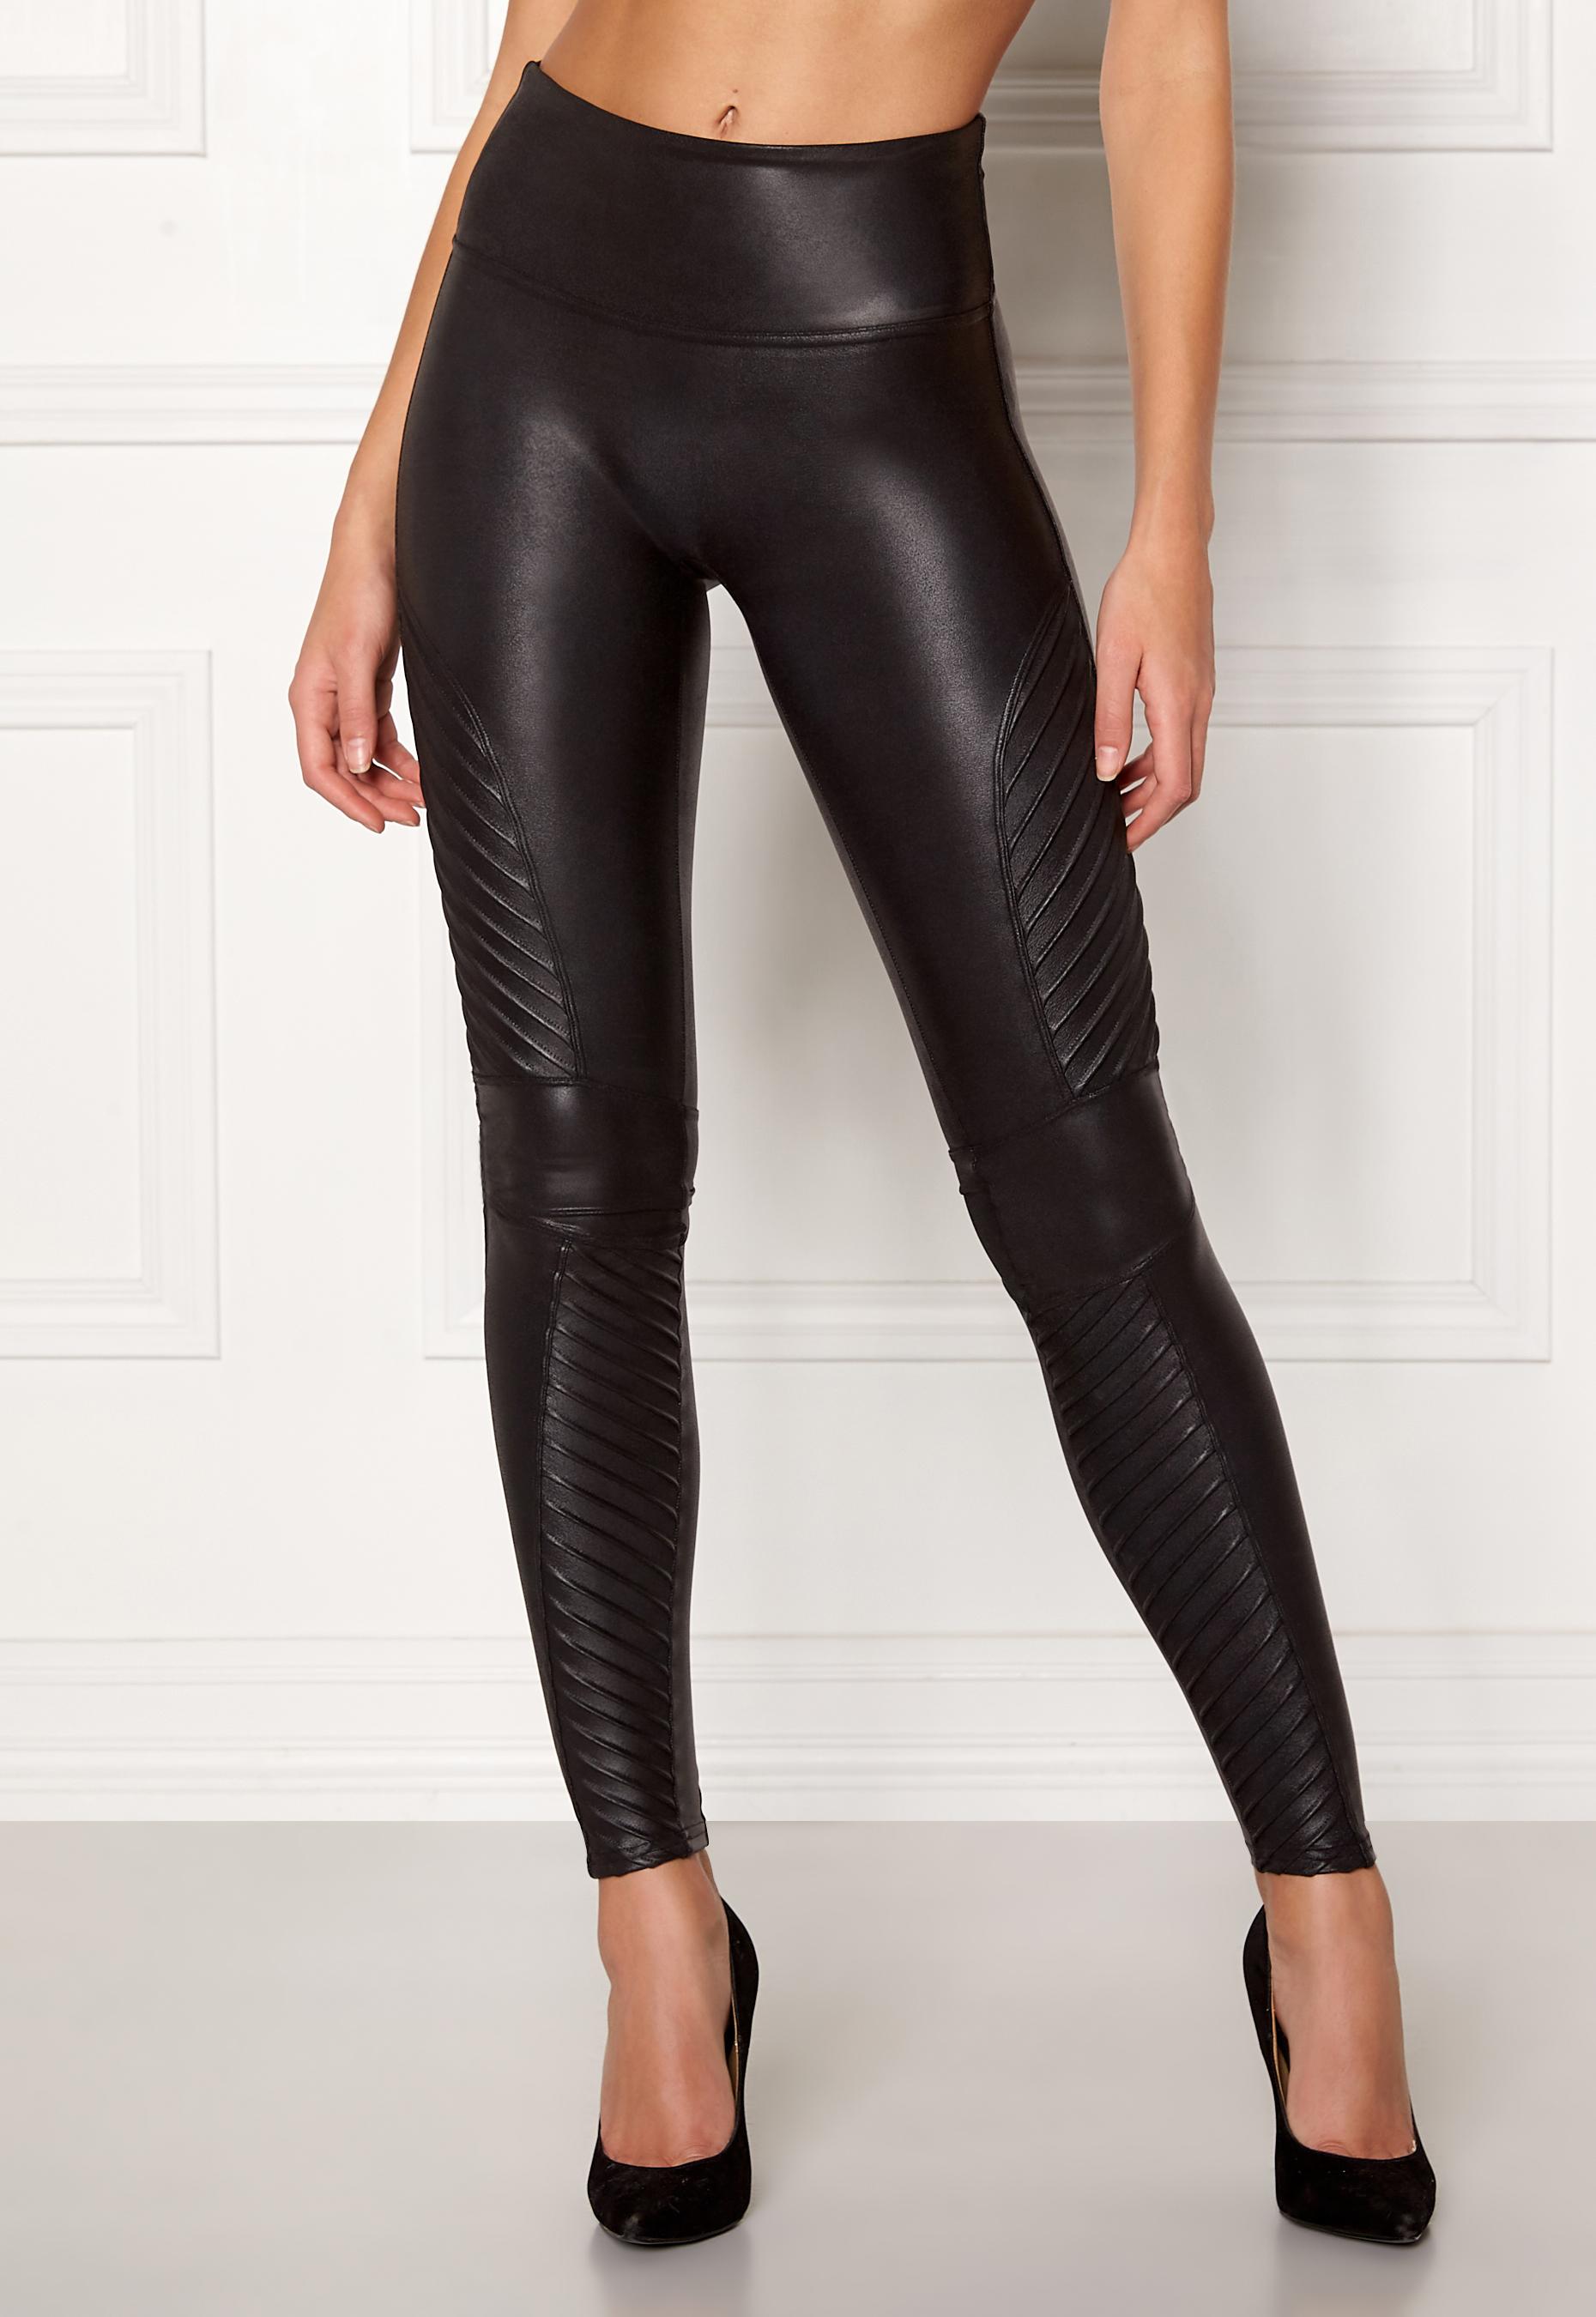 419ec14168ddf Spanx Moto Leggings Very Black - Bubbleroom